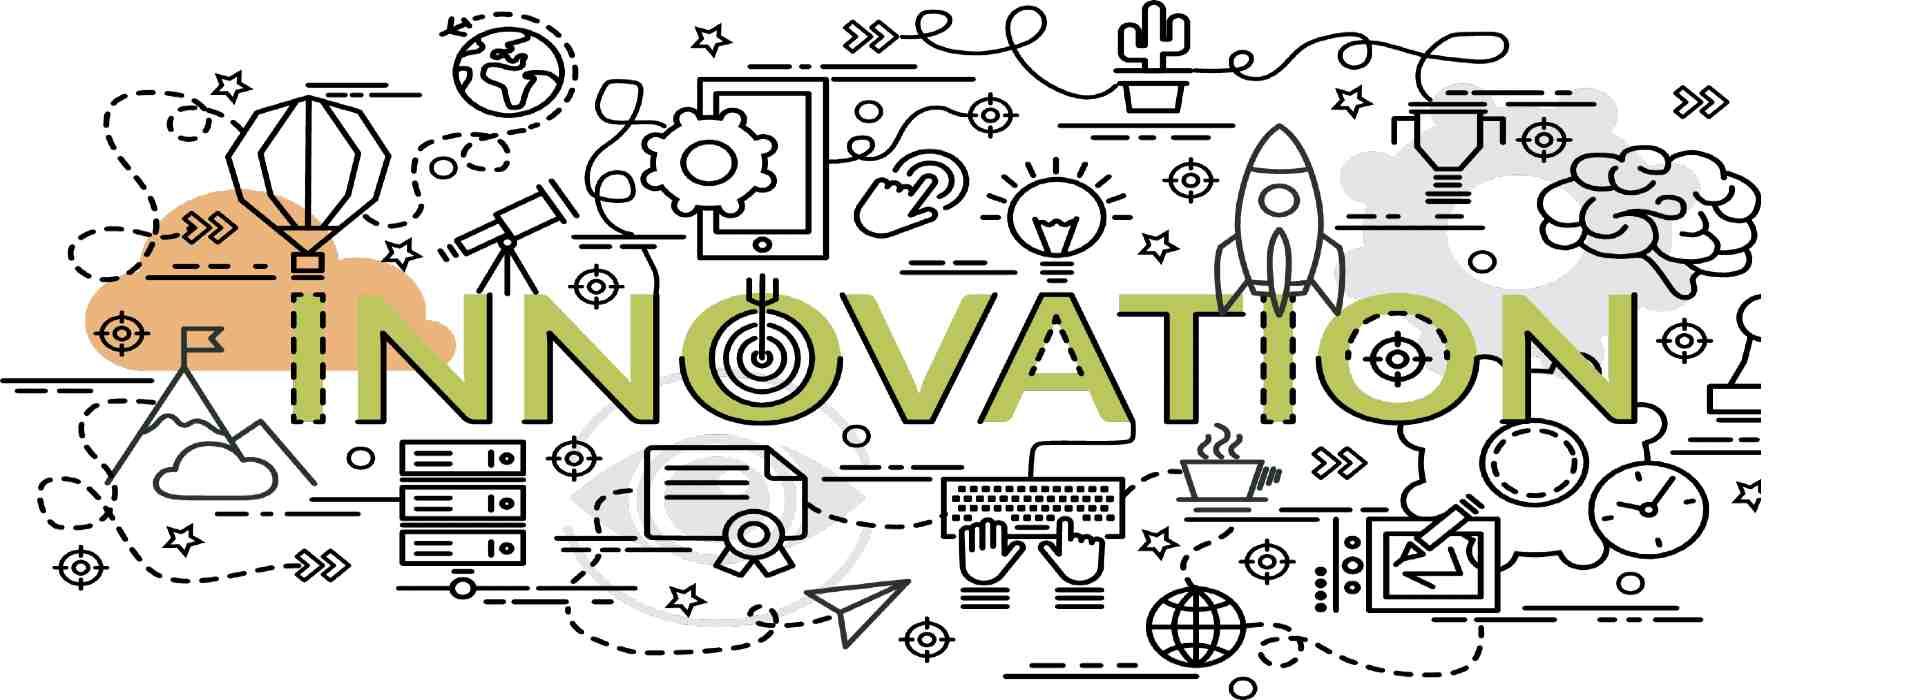 Innovazione: 670 Milioni di euro per renderla strutturale